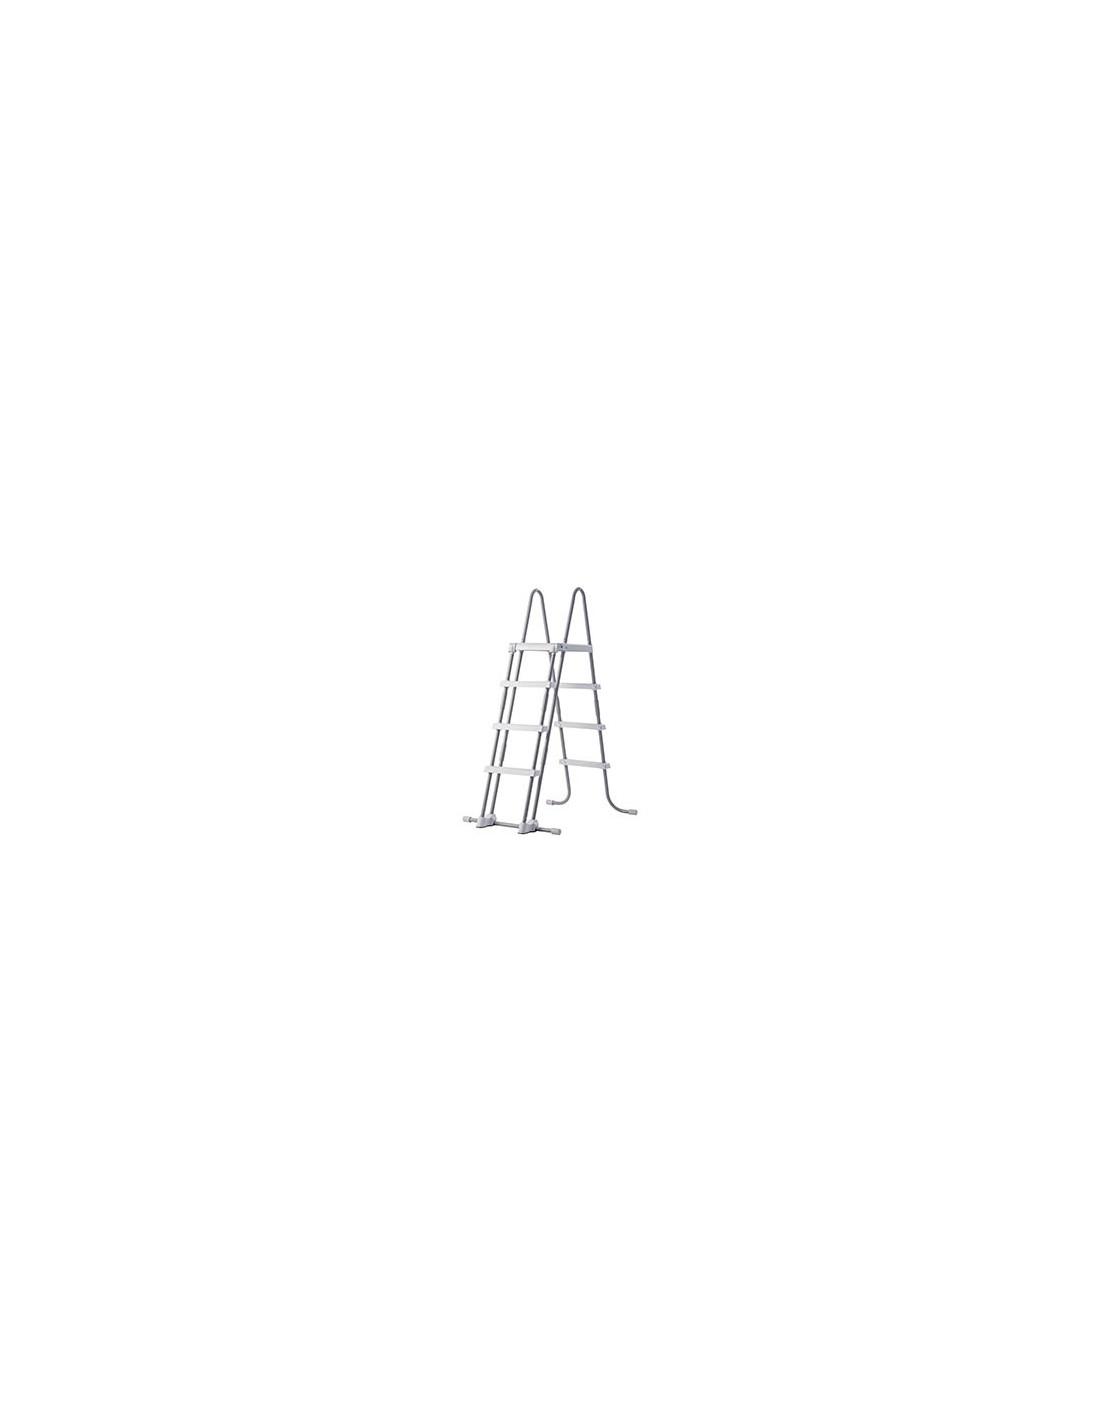 Intex piscine tubulaire rectangulaire ultra silver 457 x for Piscine hors sol ultra silver 4 57 x 2 74 intex